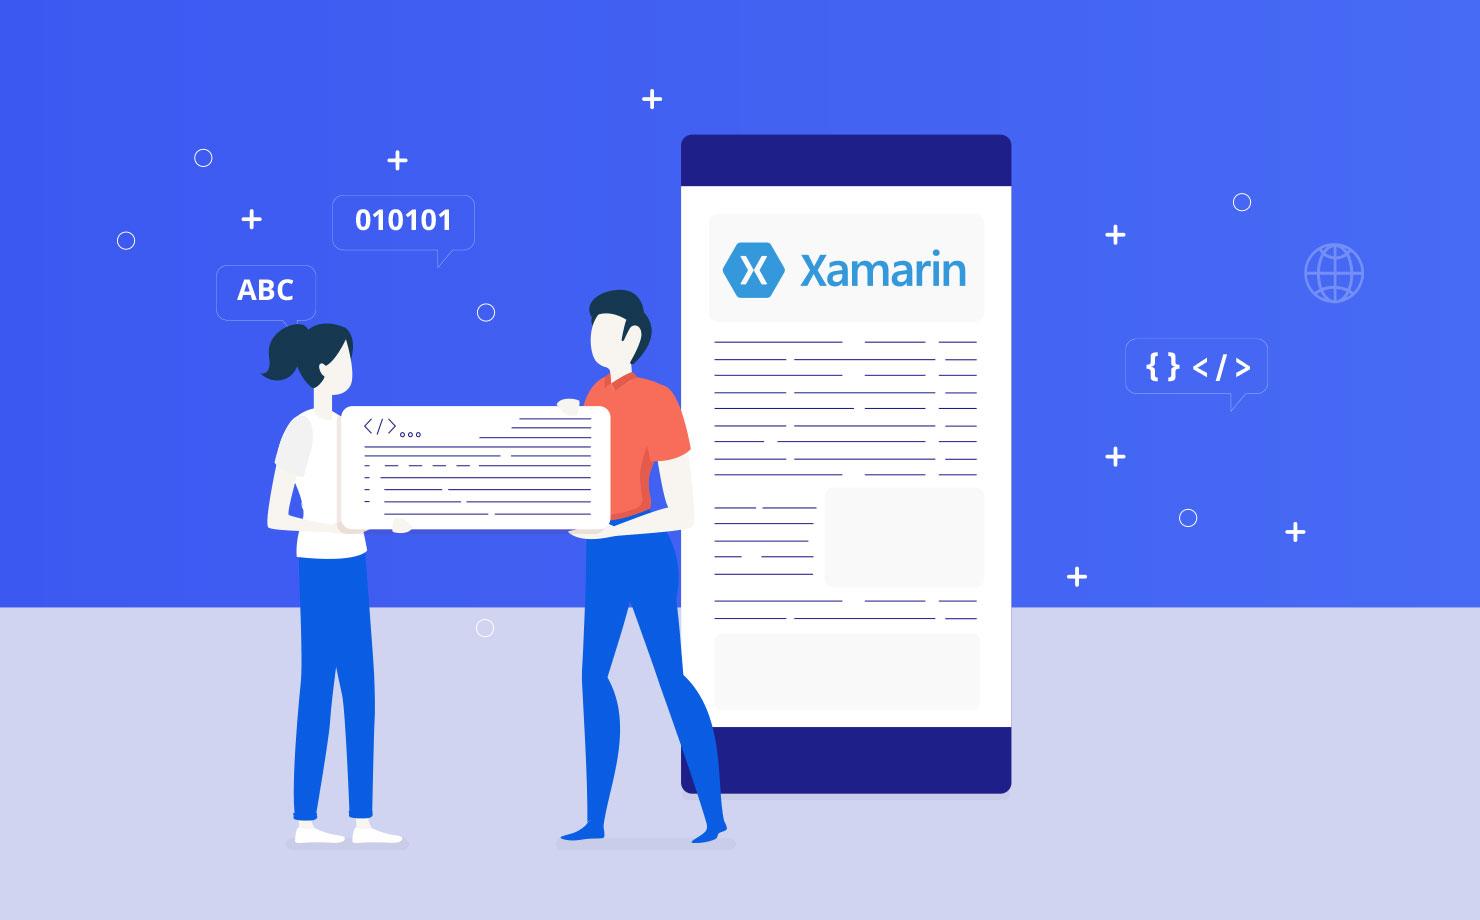 Xamarin preferred